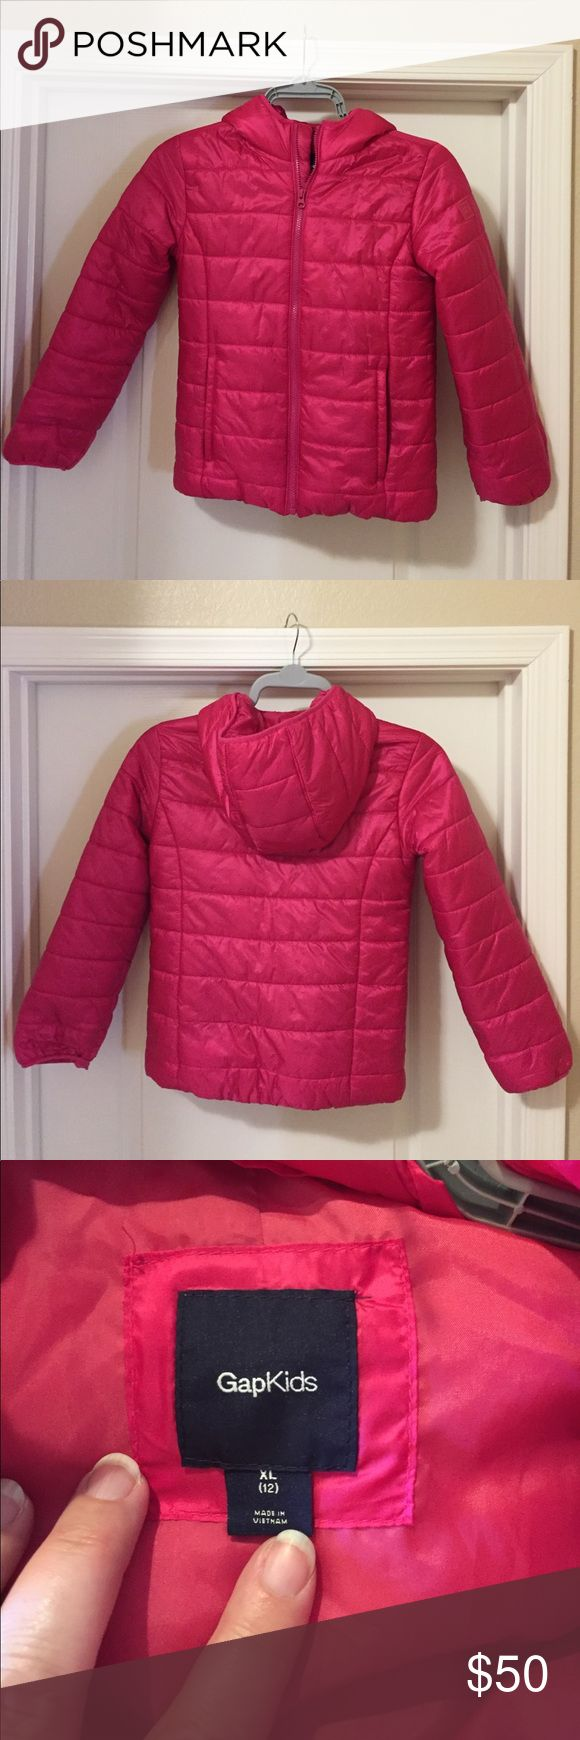 Girls Winter coat Gap hot pink snow coat. Brand new Worn once (reside in AZ). GAP Jackets & Coats Puffers